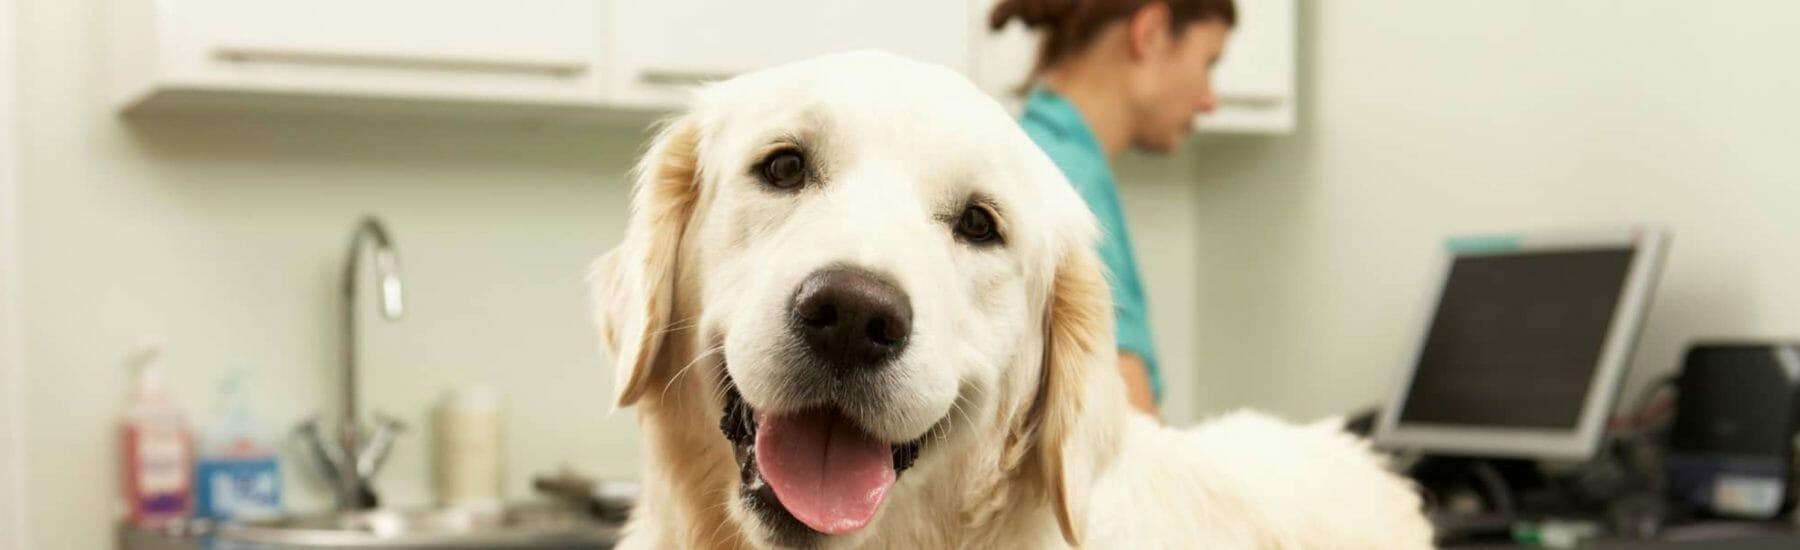 Happy dog in a vet examination room